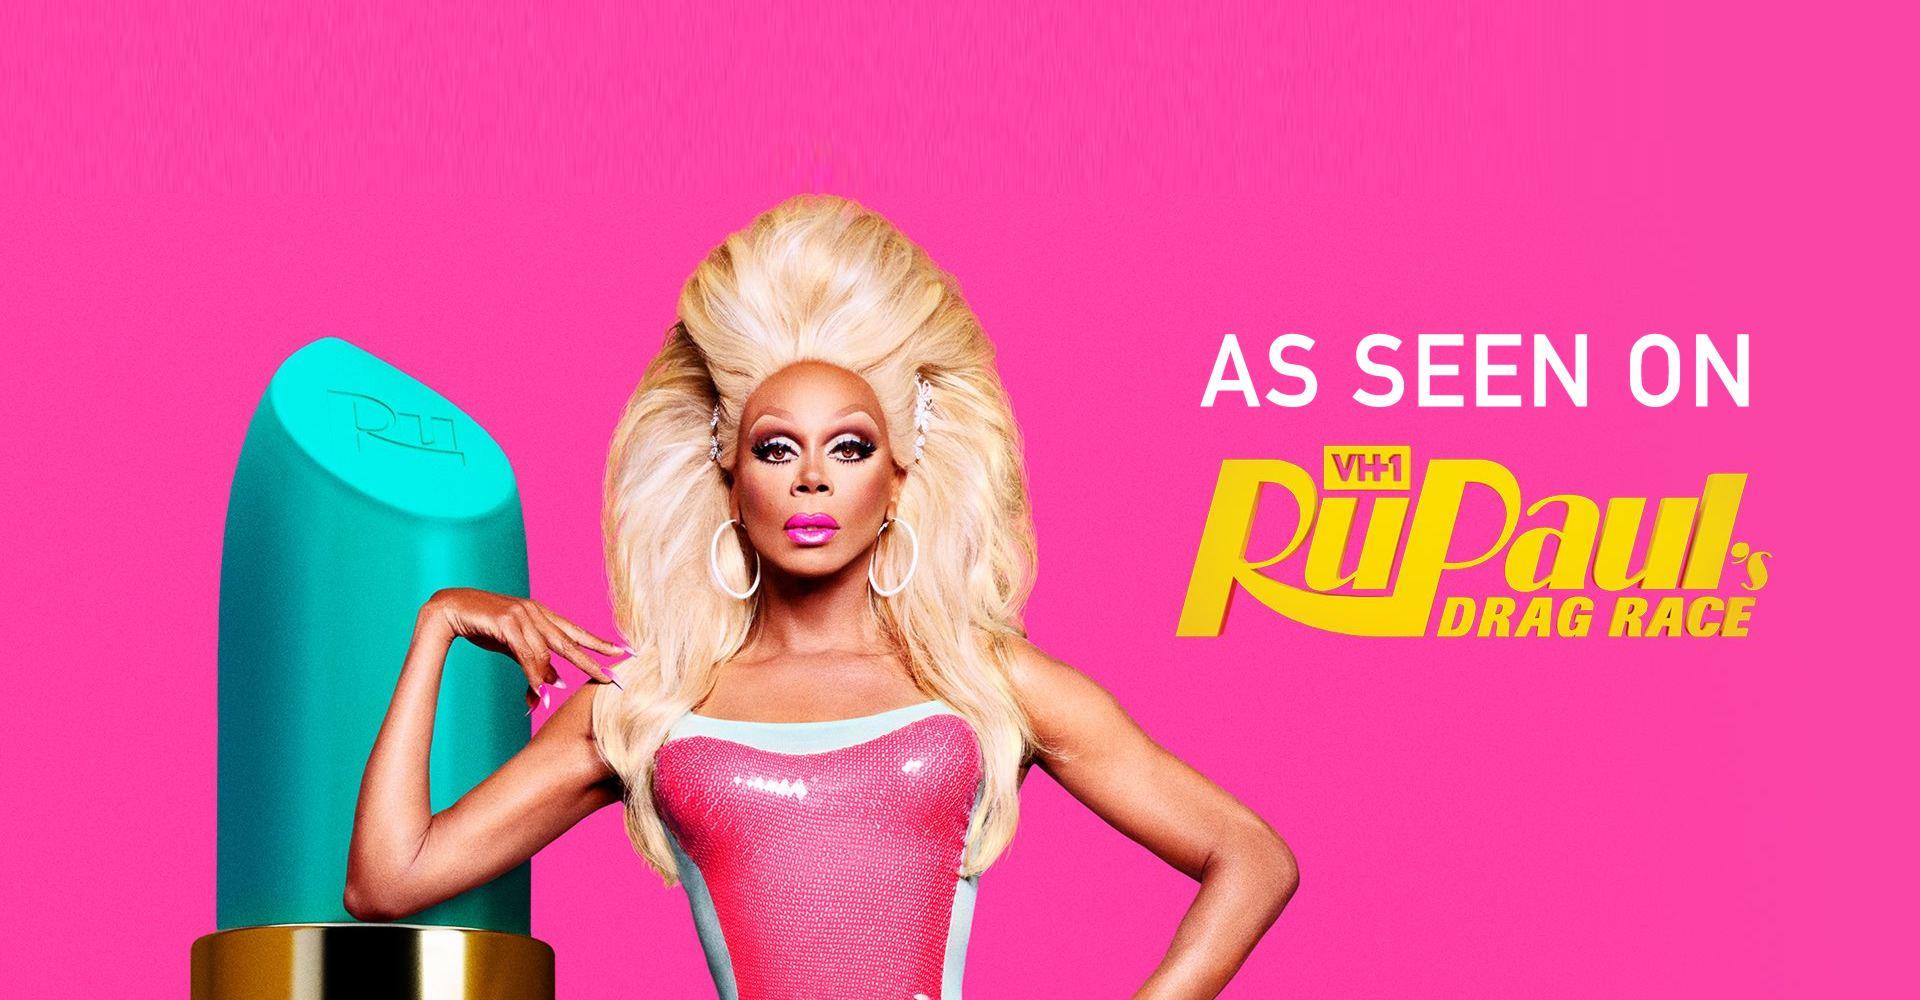 MuLondon - As Seen On RuPaul's Drag Race Season 11